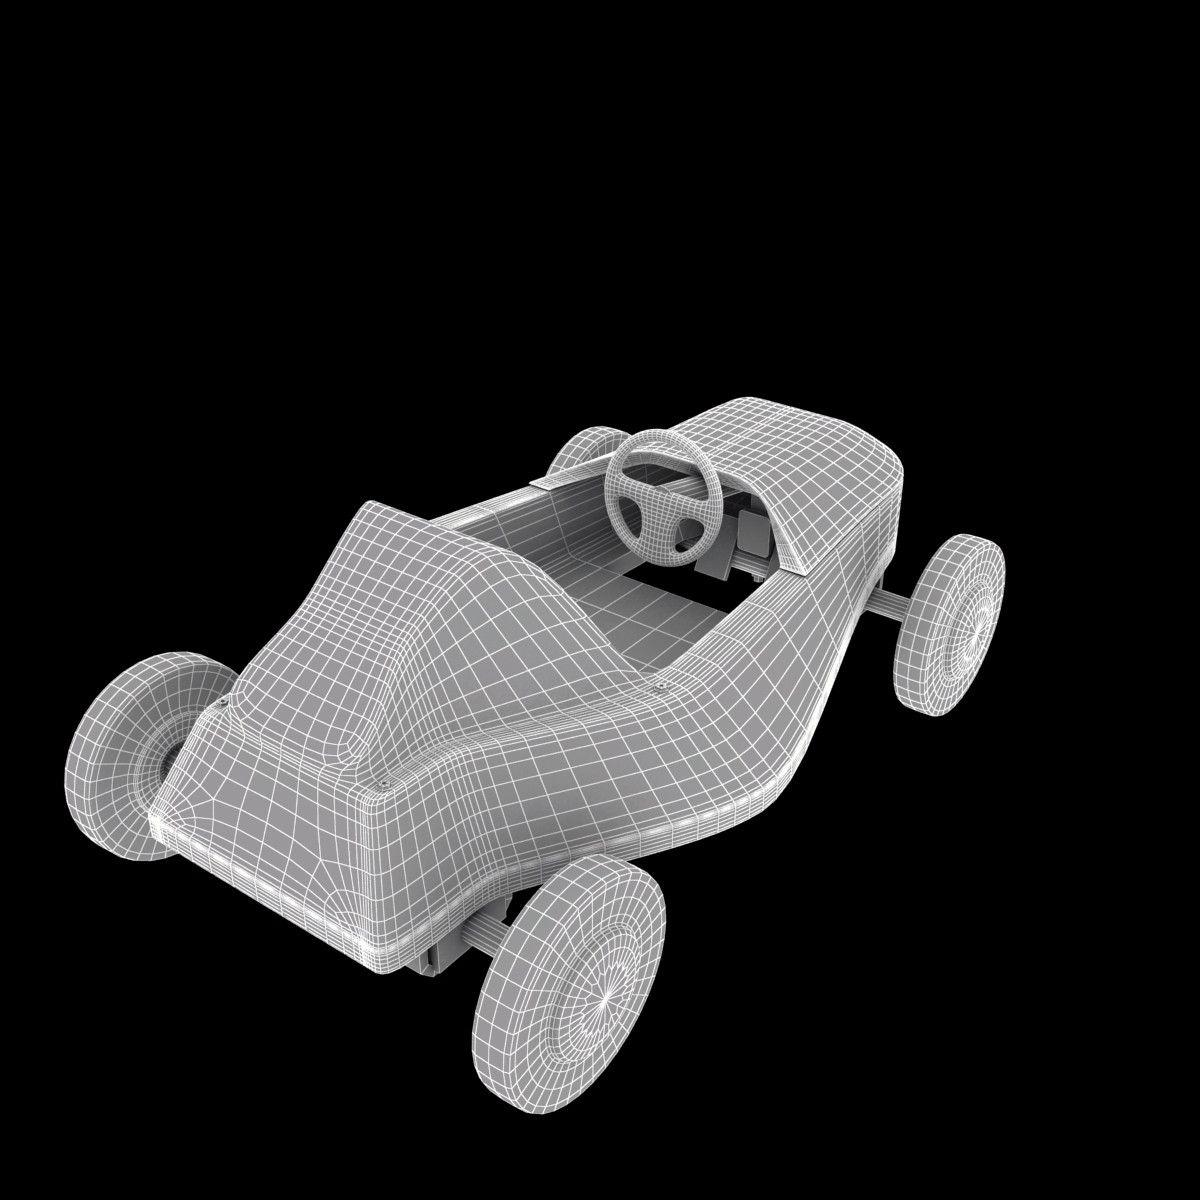 Toys car image  d model toy car  Para Niños  Pinterest  Toy d and Models